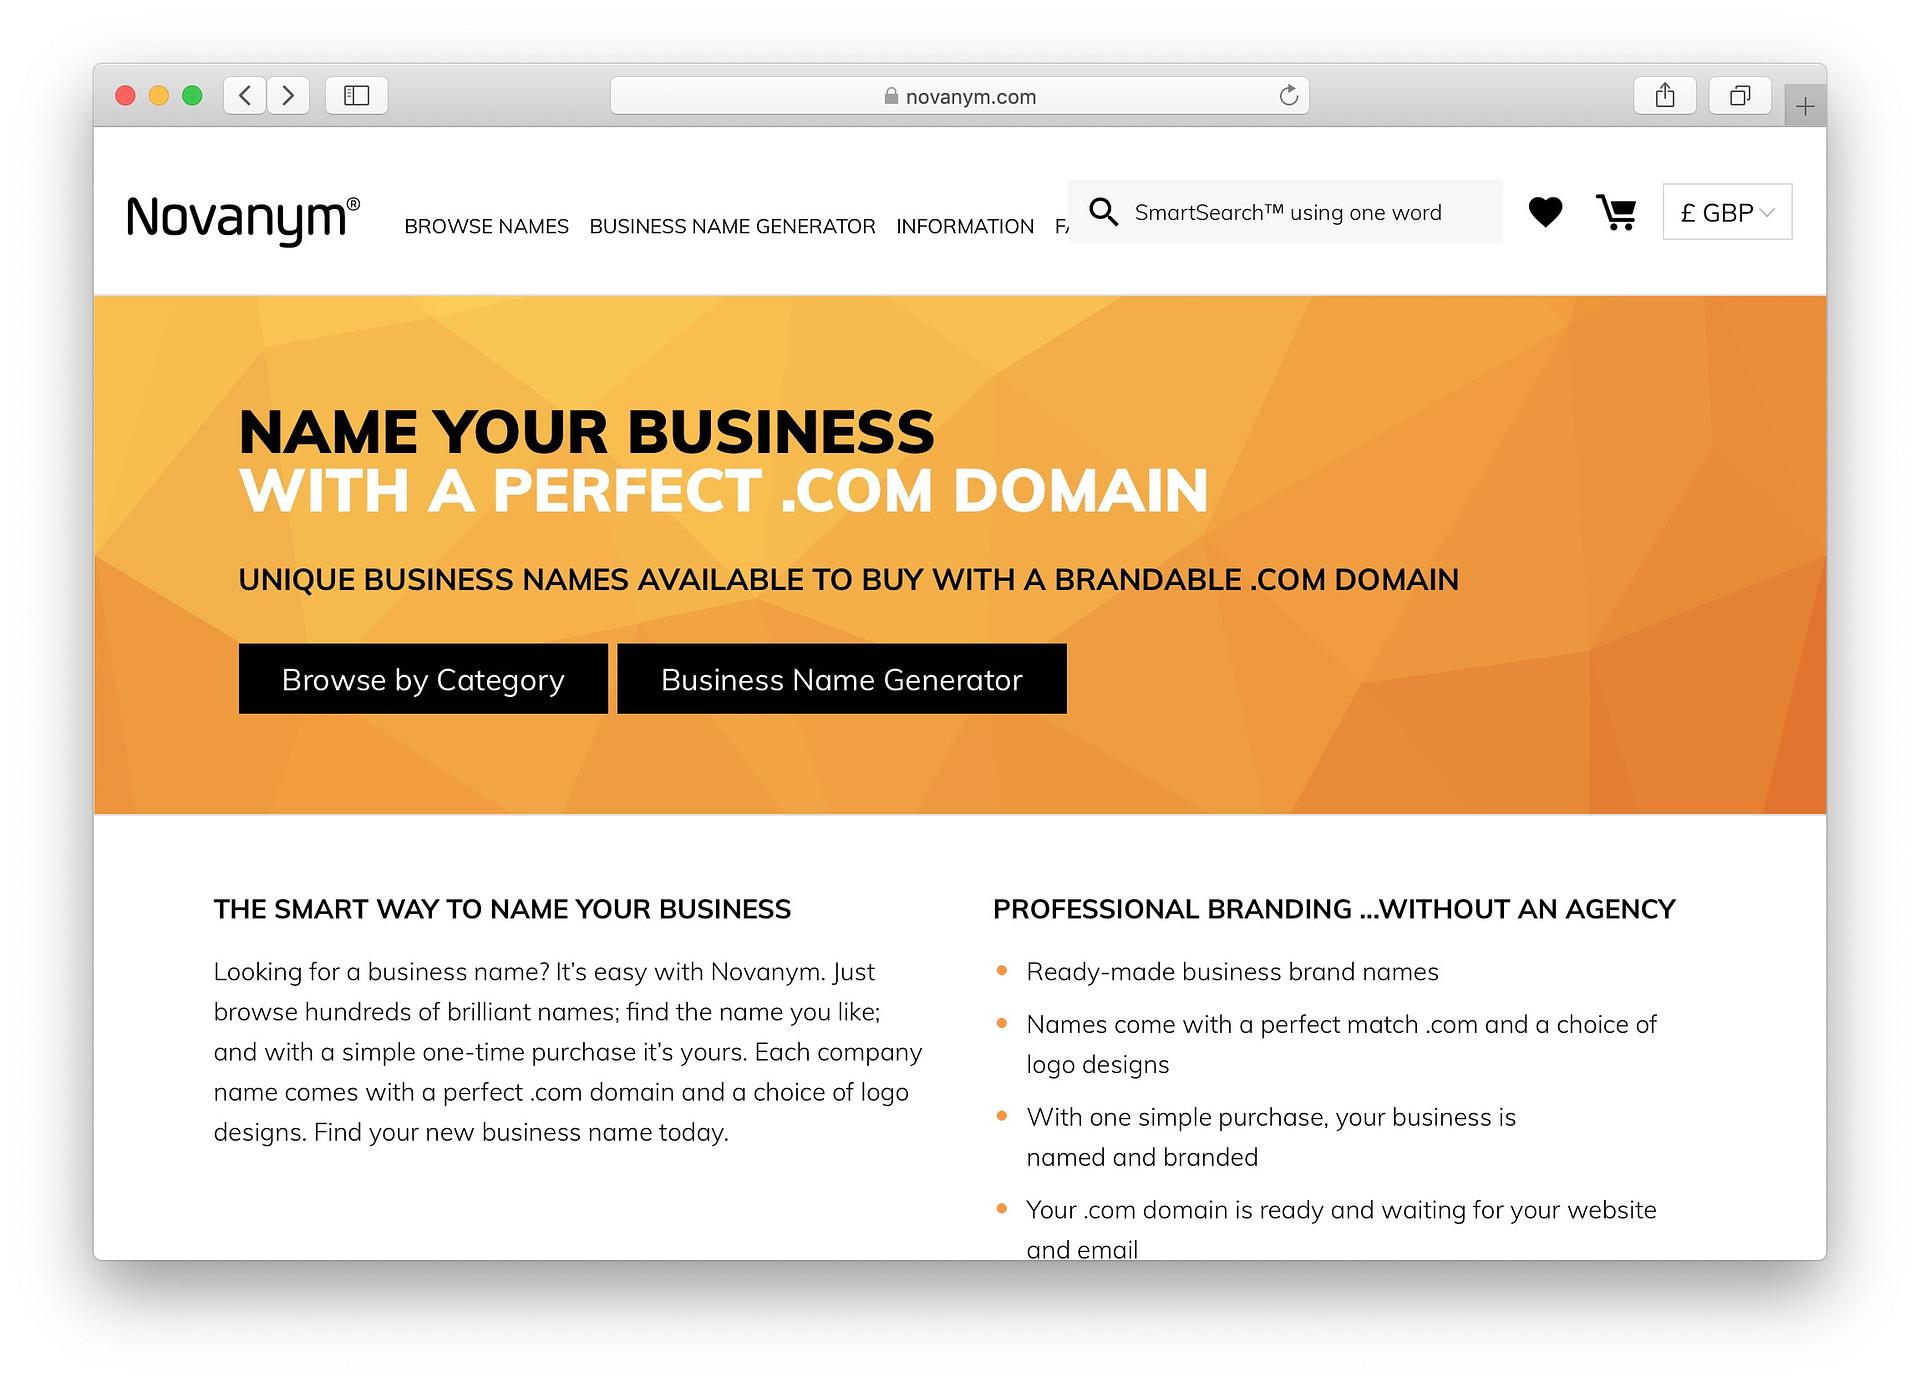 Best free business name generators: Novanym